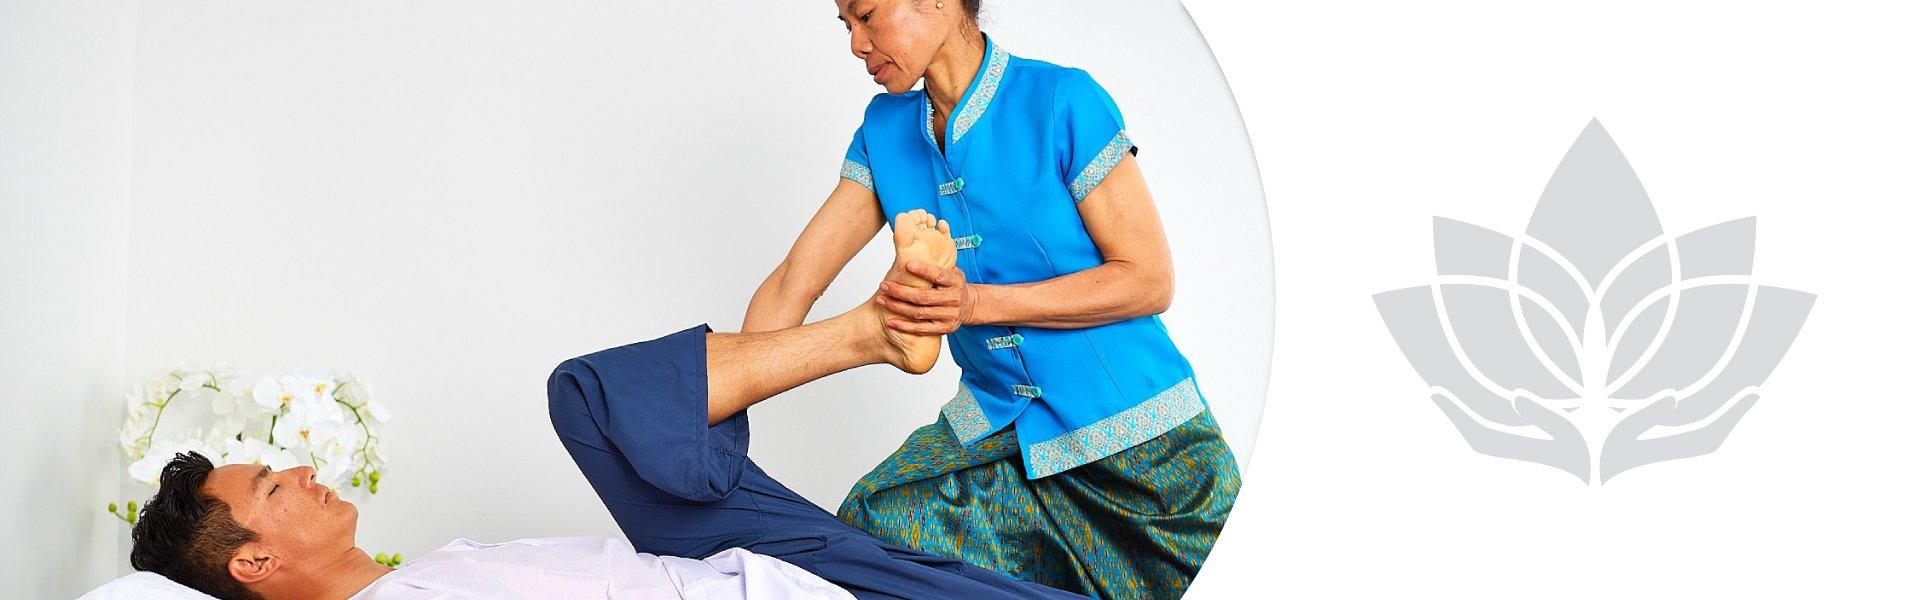 Thai Massages at Krisada Thai Massage Clinic in Mount Maunganui V2